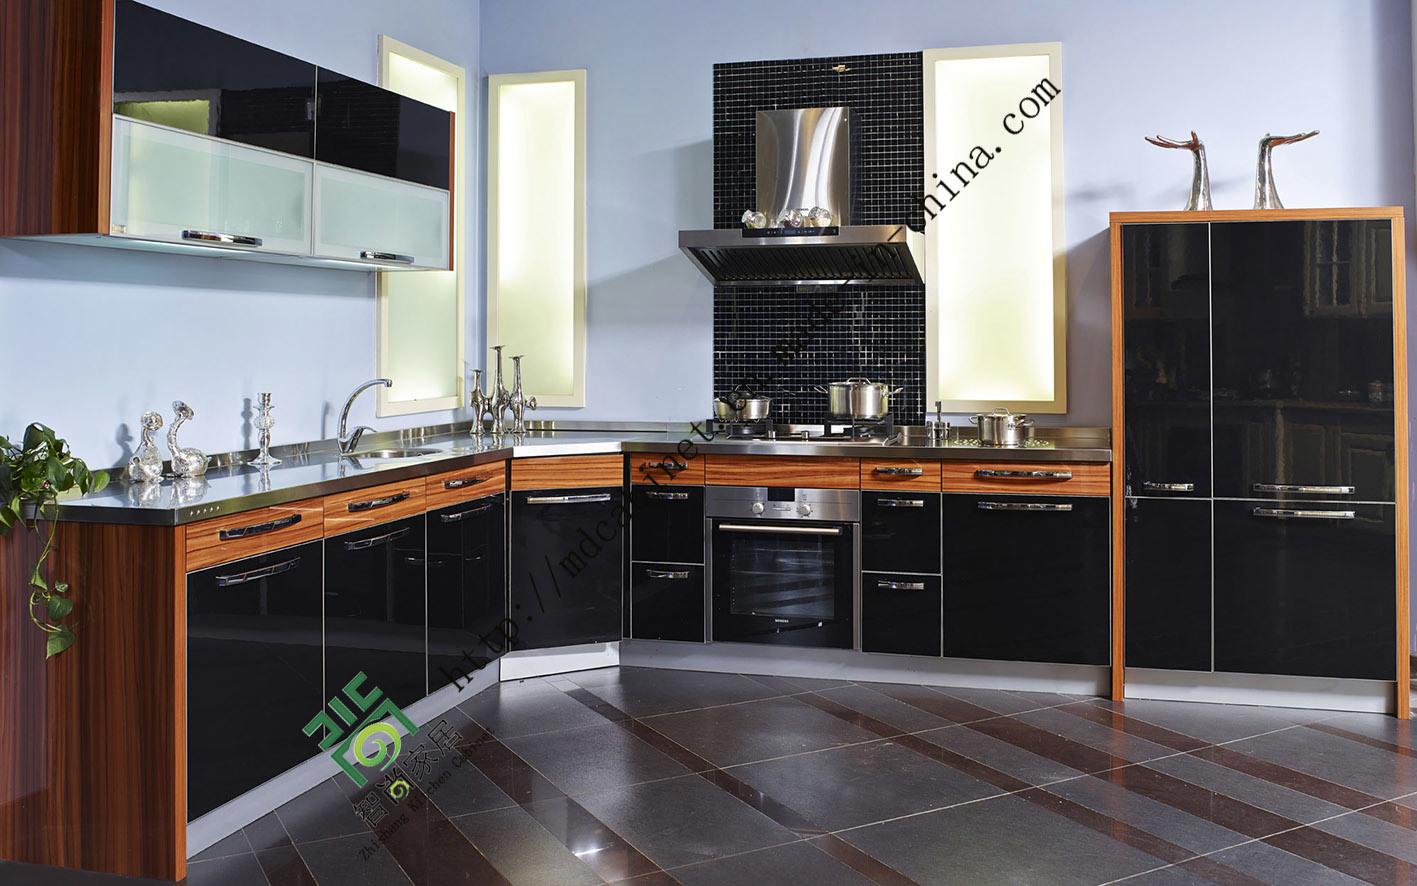 China high gloss uv kitchen cabinet zs 58 photos for A z kitchen cabinets ltd